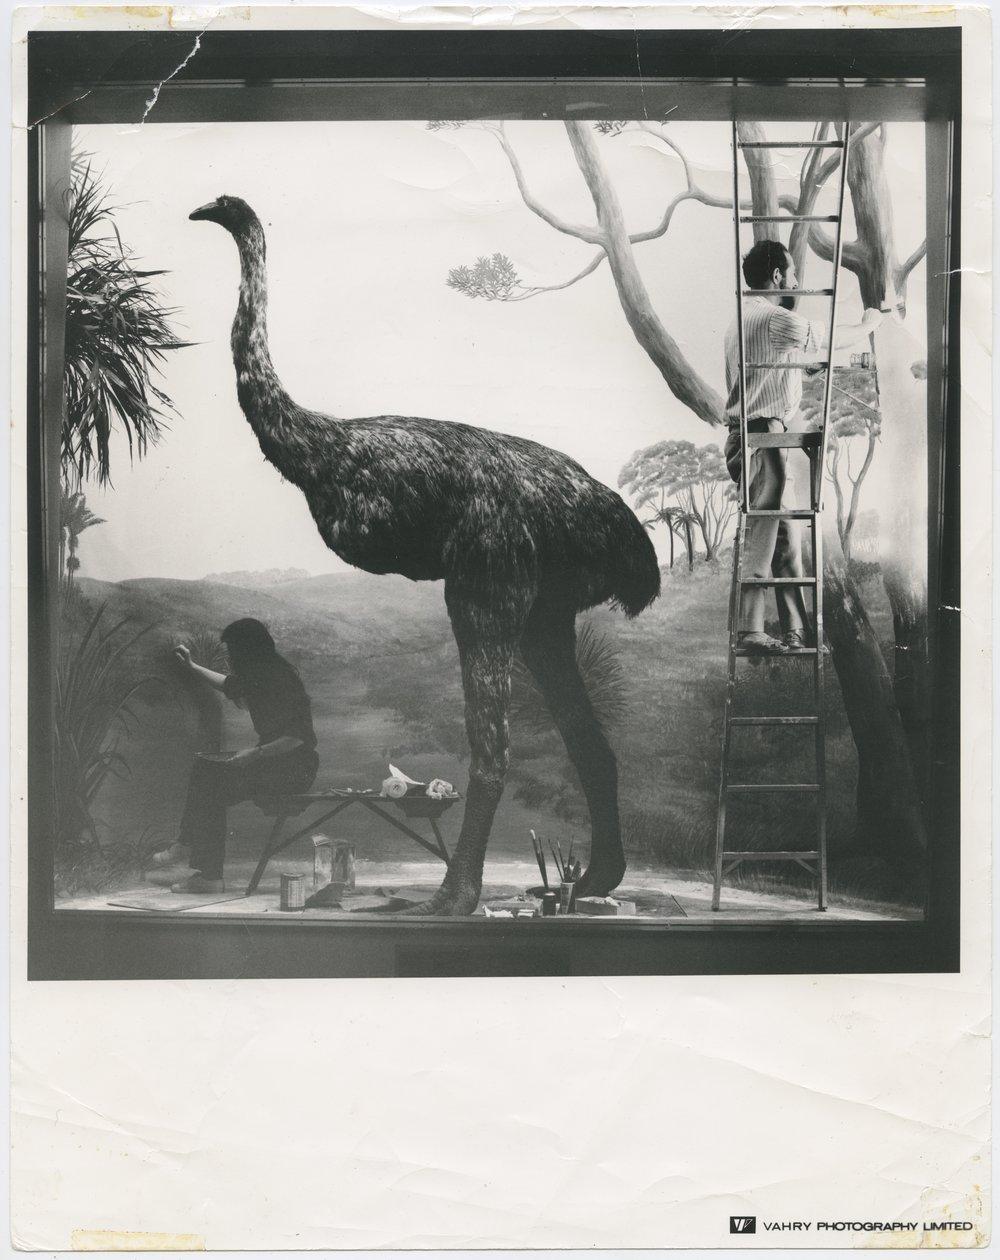 Work in progress on the new Hall of New Zealand, 1972. Auckland War Memorial Museum Tāmaki Paenga Hira